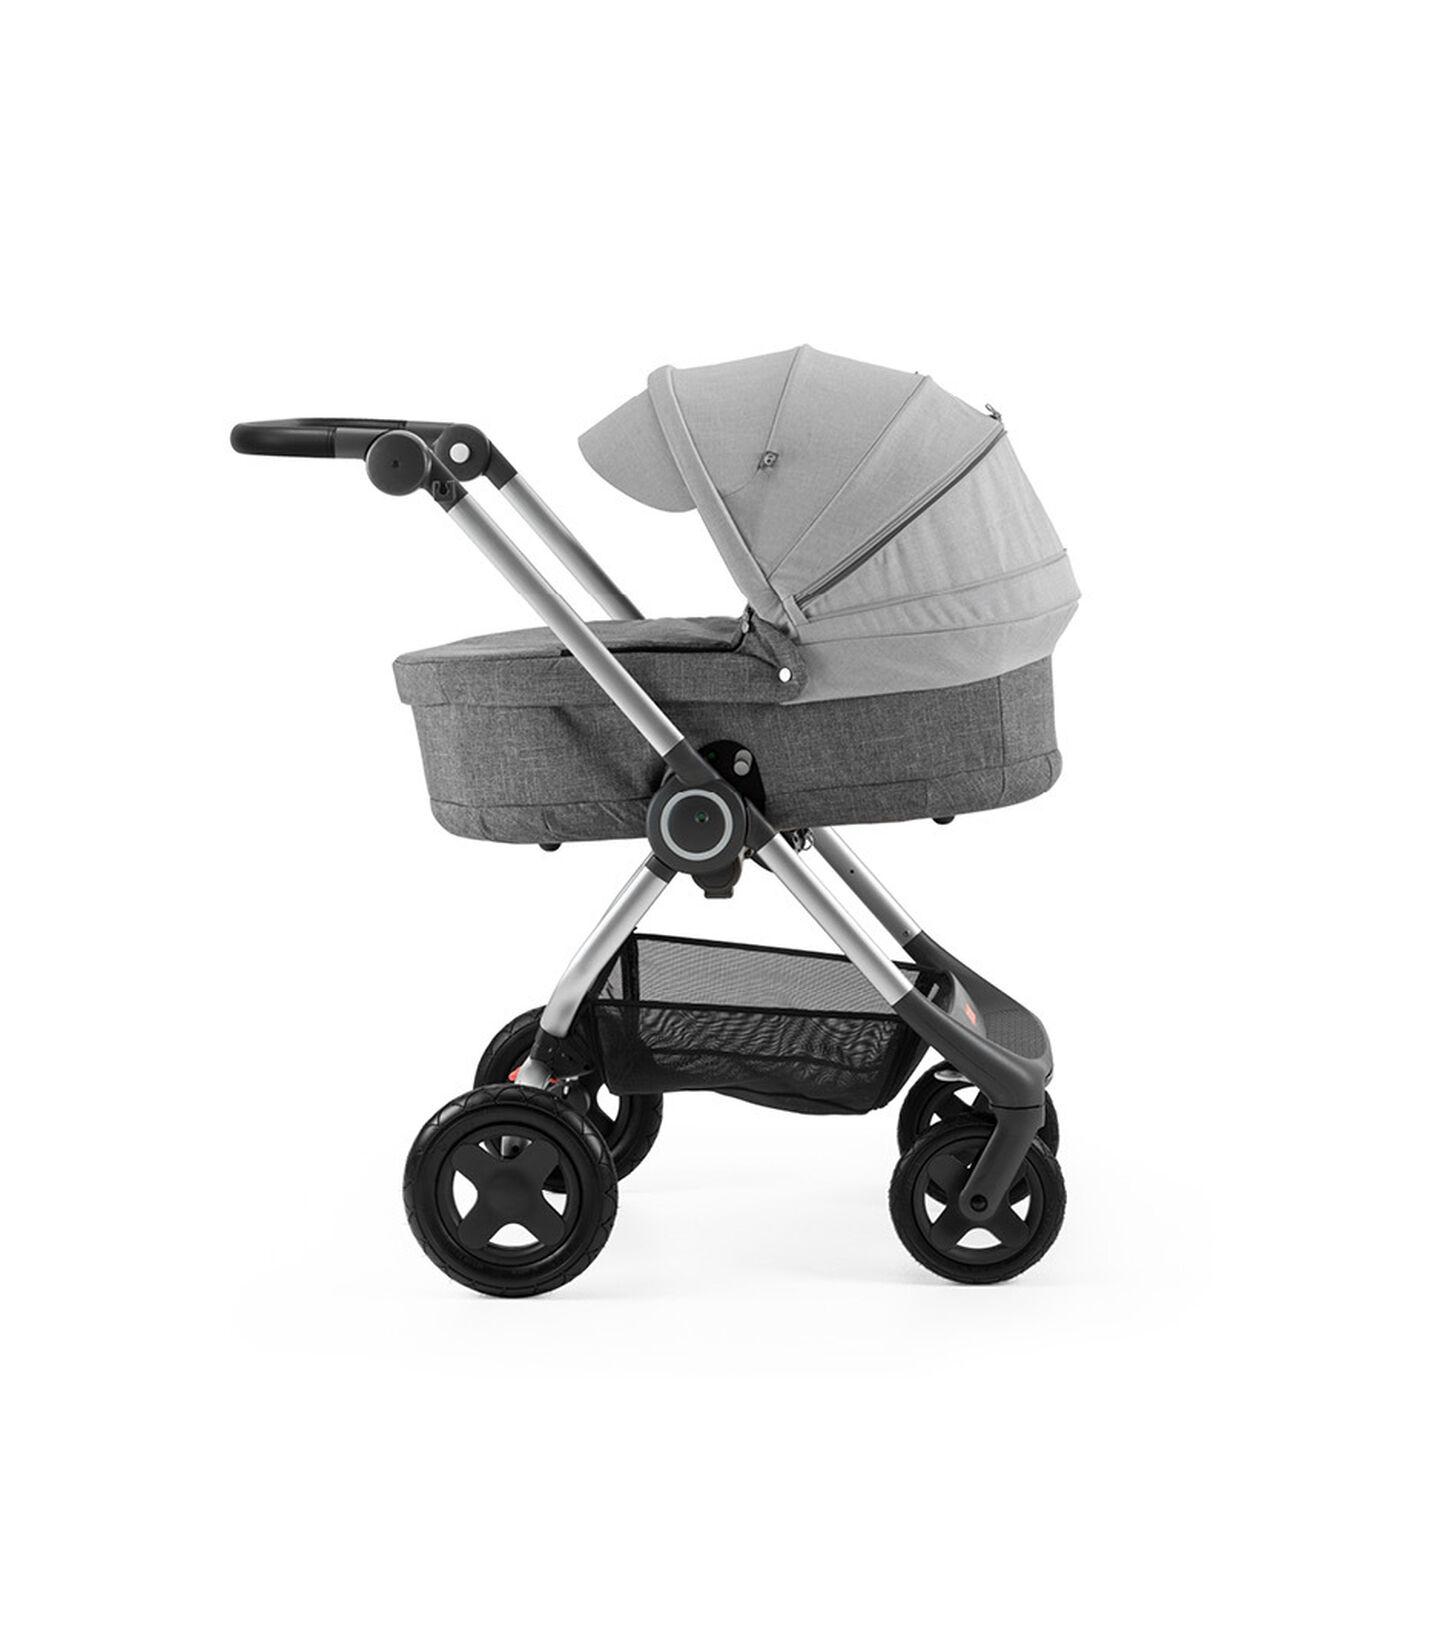 Stokke® Scoot™ with Carry Cot Black Melange and Grey Melange Canopy.